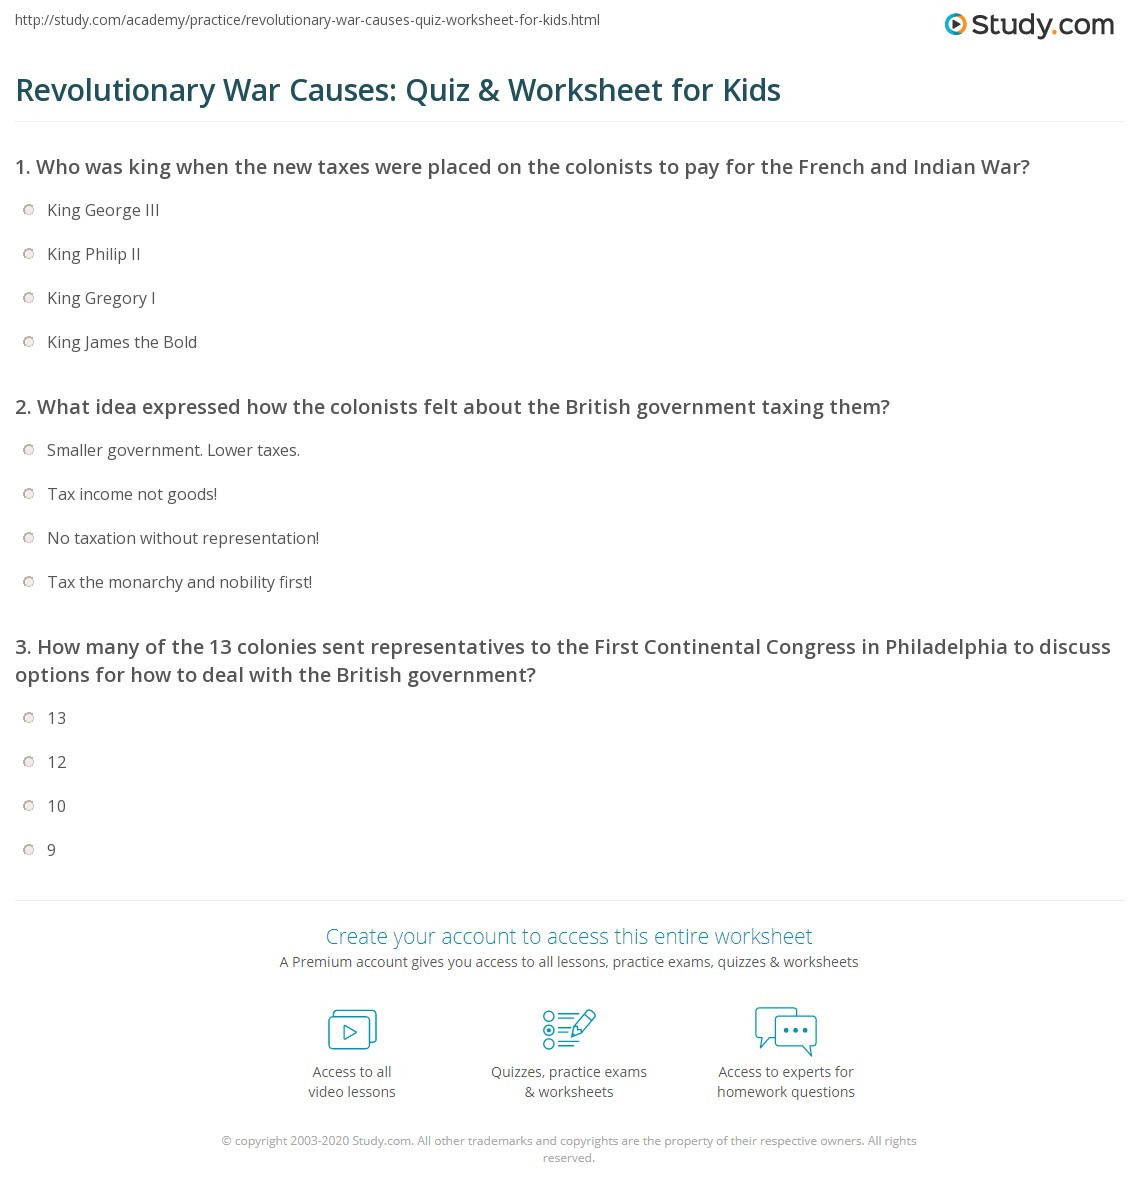 Revolutionary War Causes: Quiz & Worksheet for Kids | Study.com